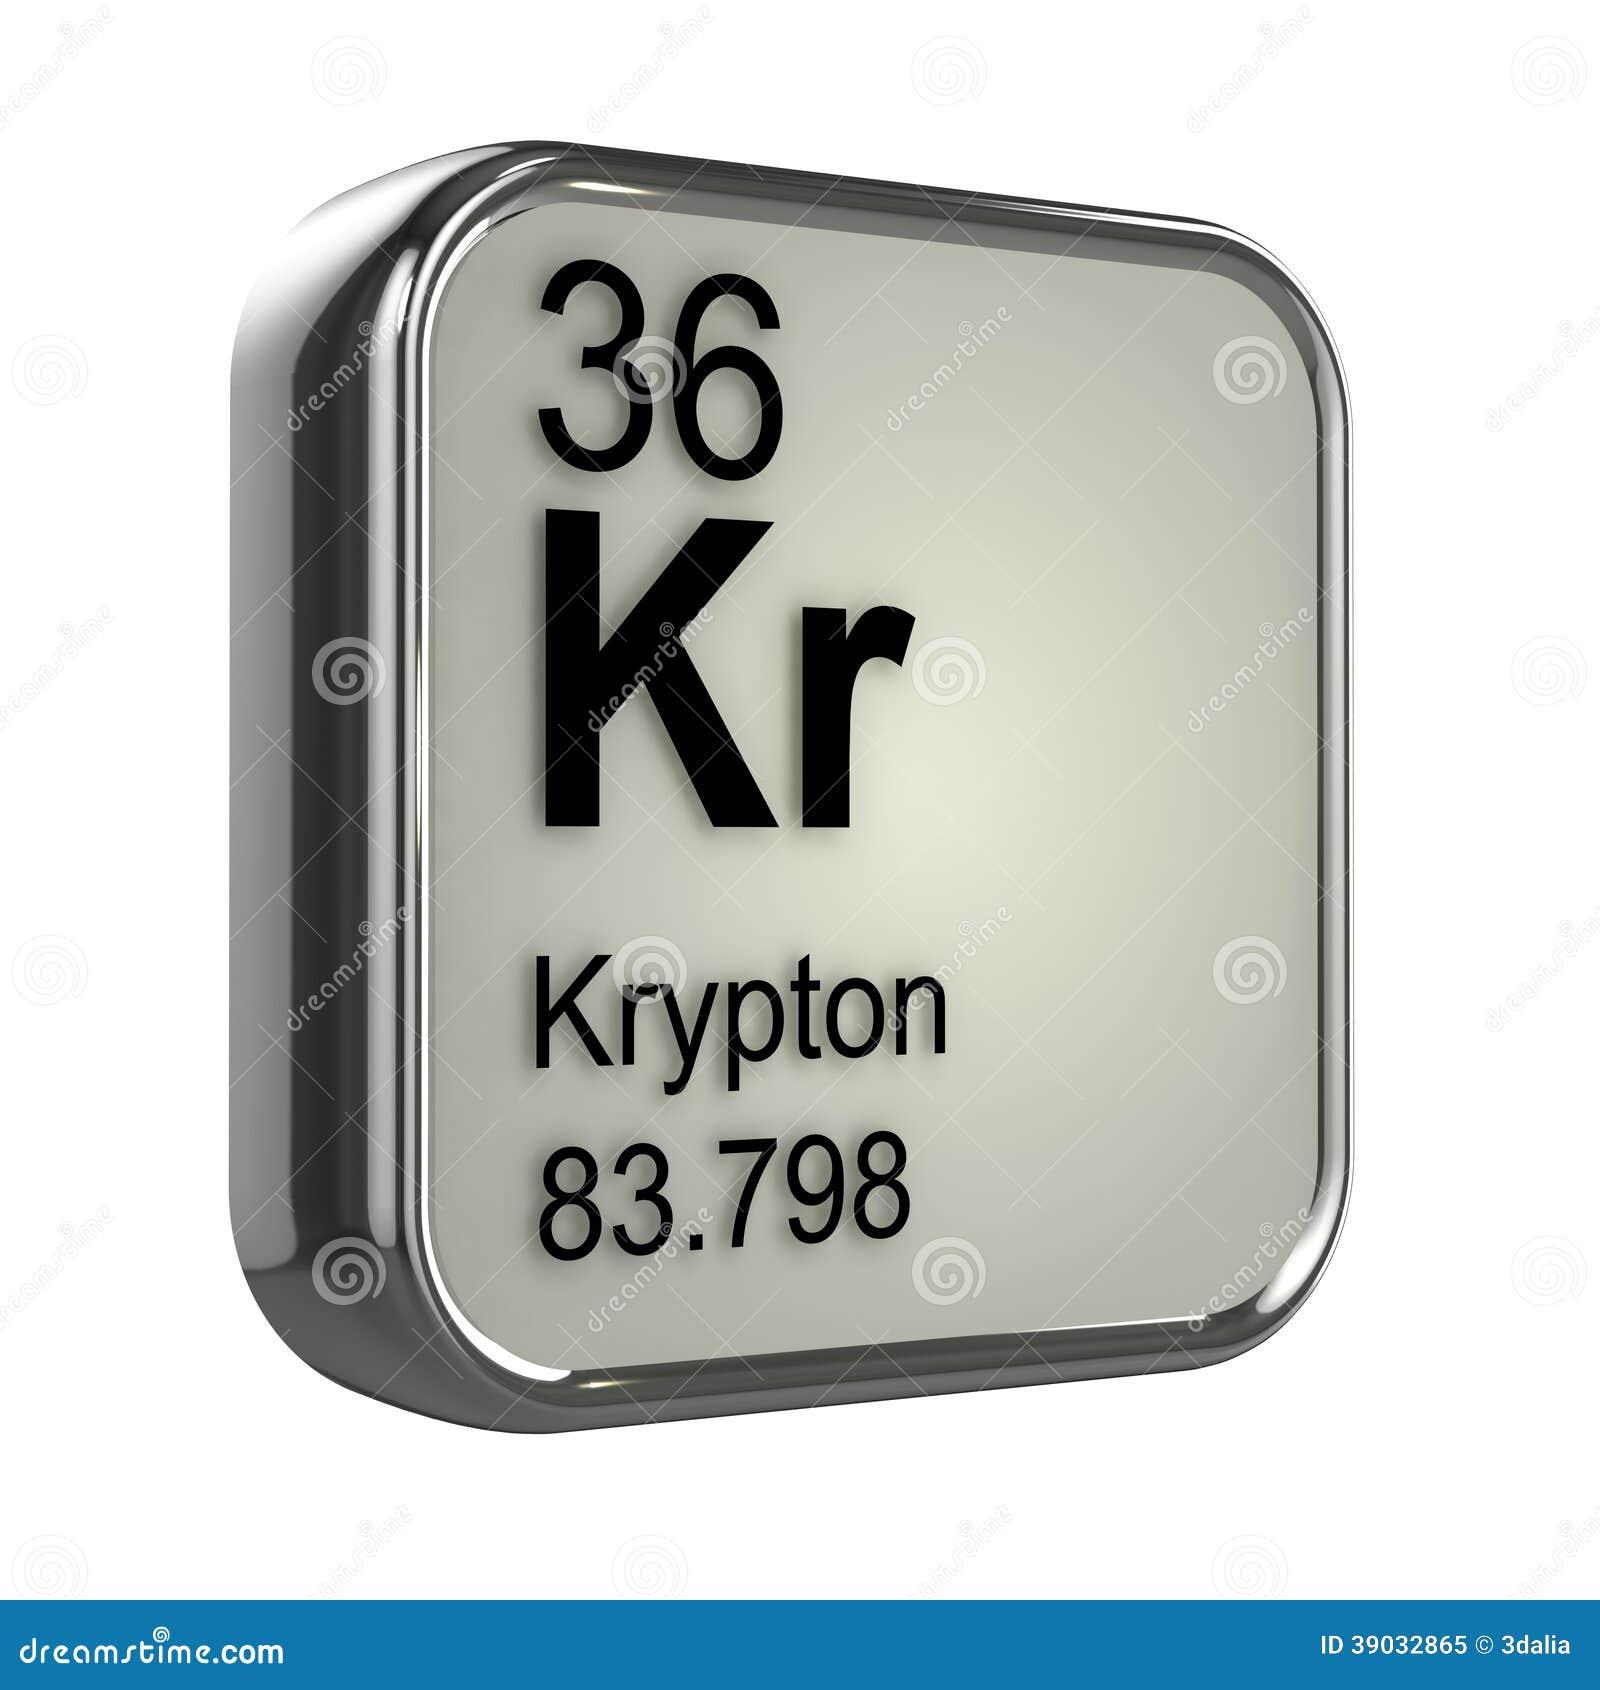 3d krypton element stock illustration image of atomic 39032865 royalty free stock photo gamestrikefo Images